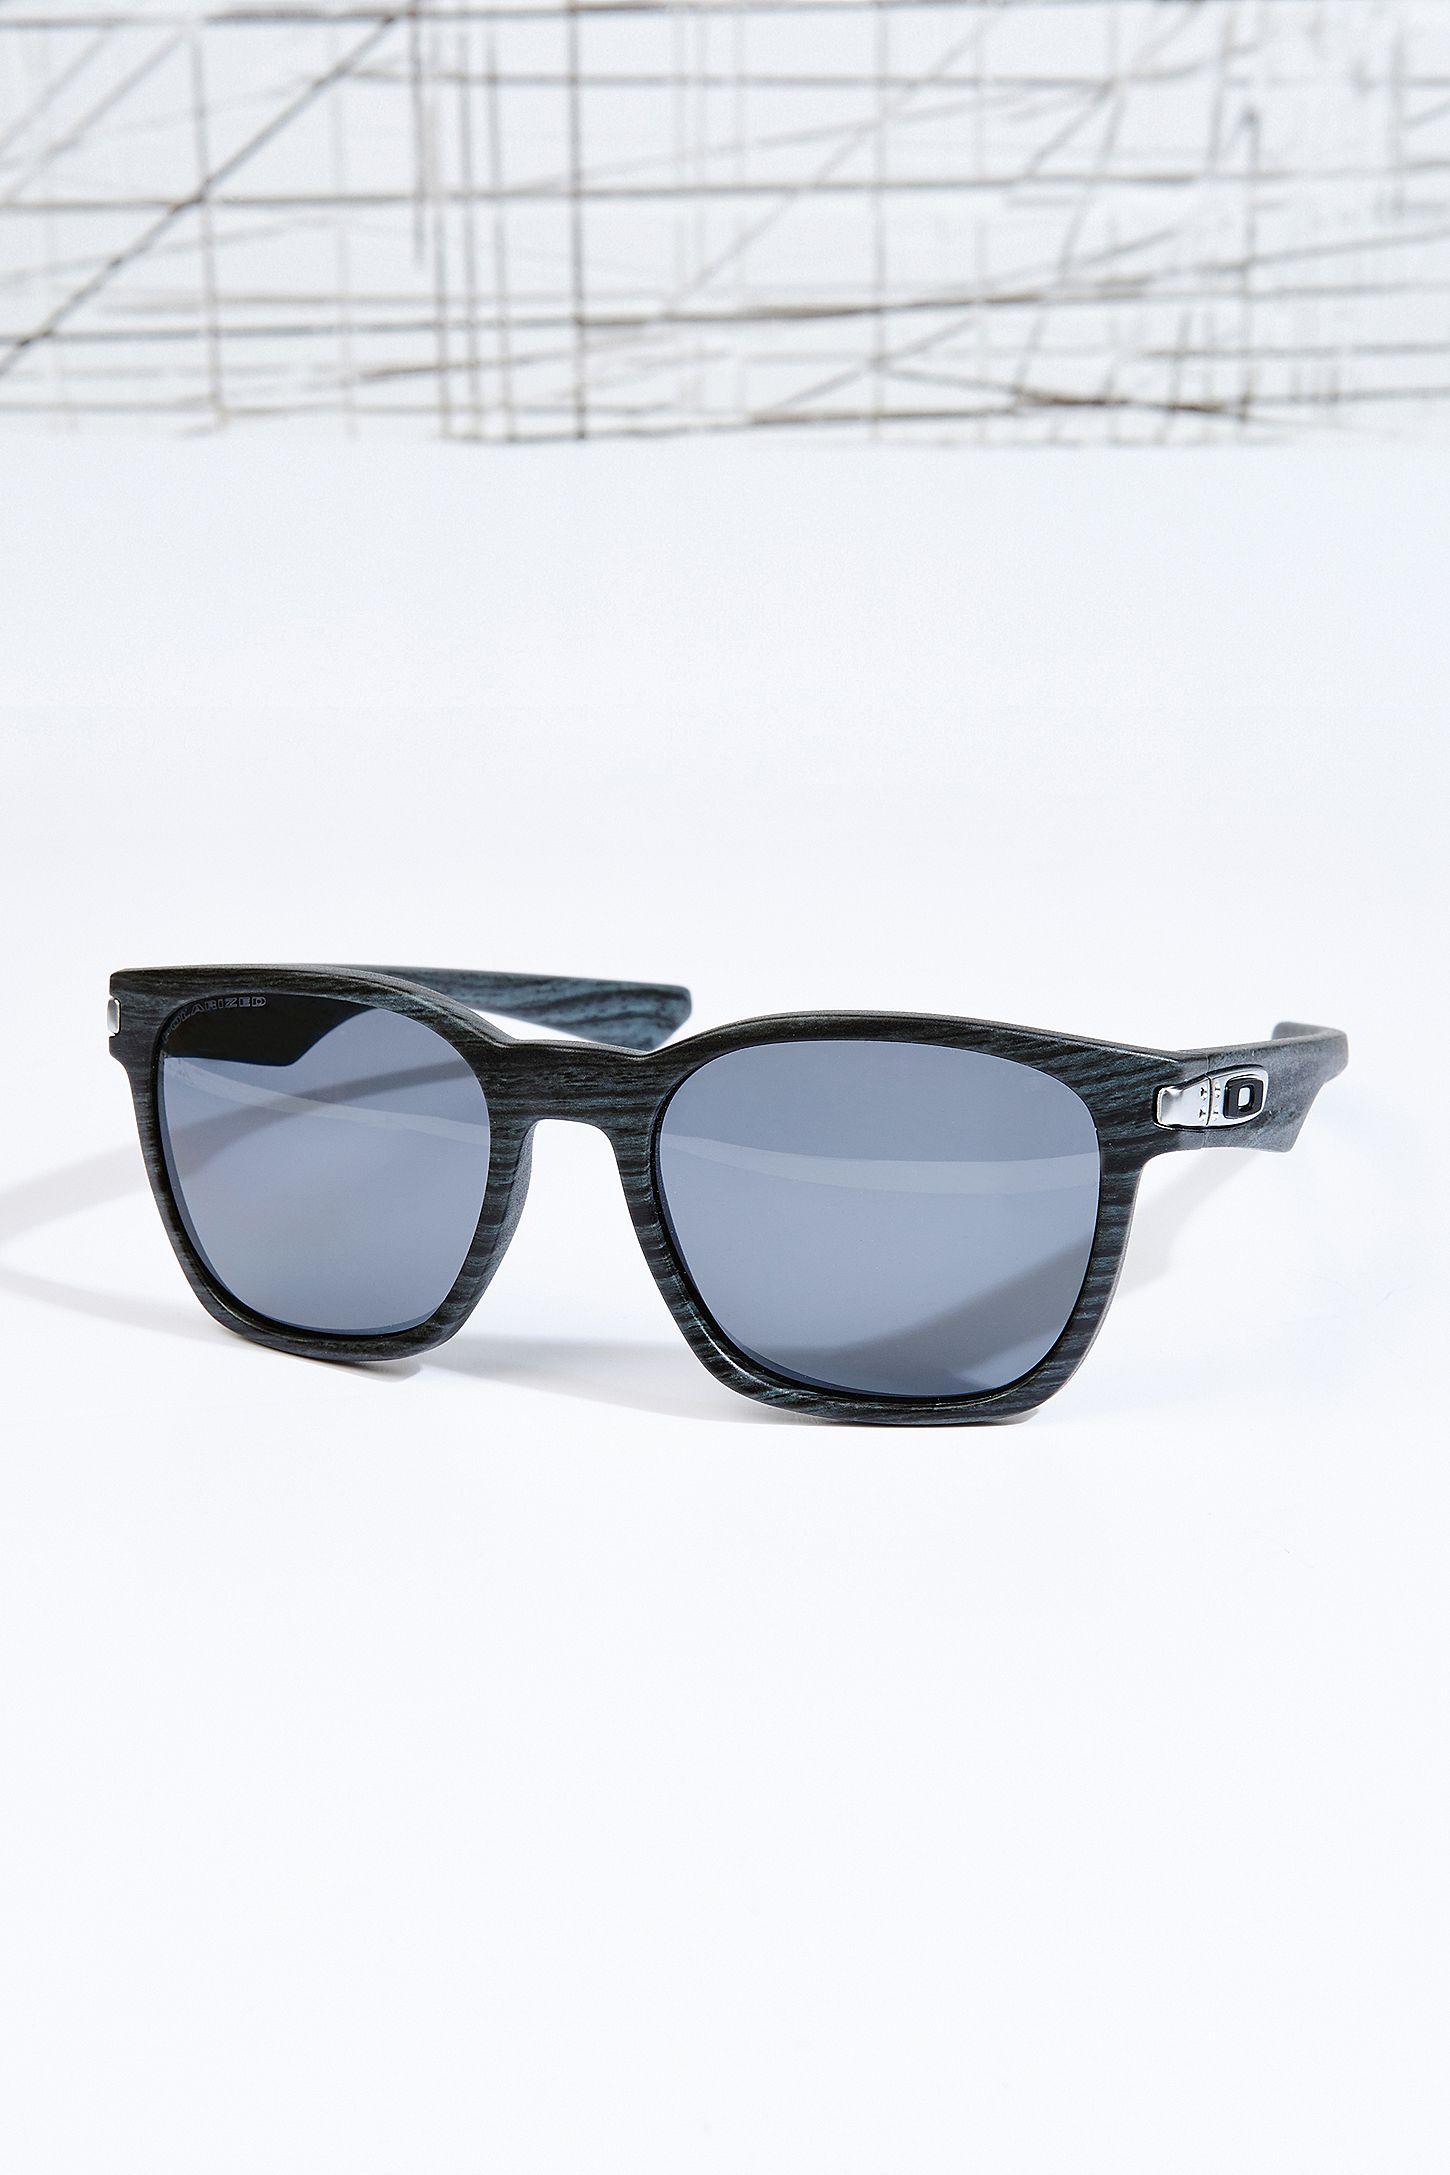 098dc0e7b1e Oakley Garage Rock Wood Grain Sunglasses in Blue